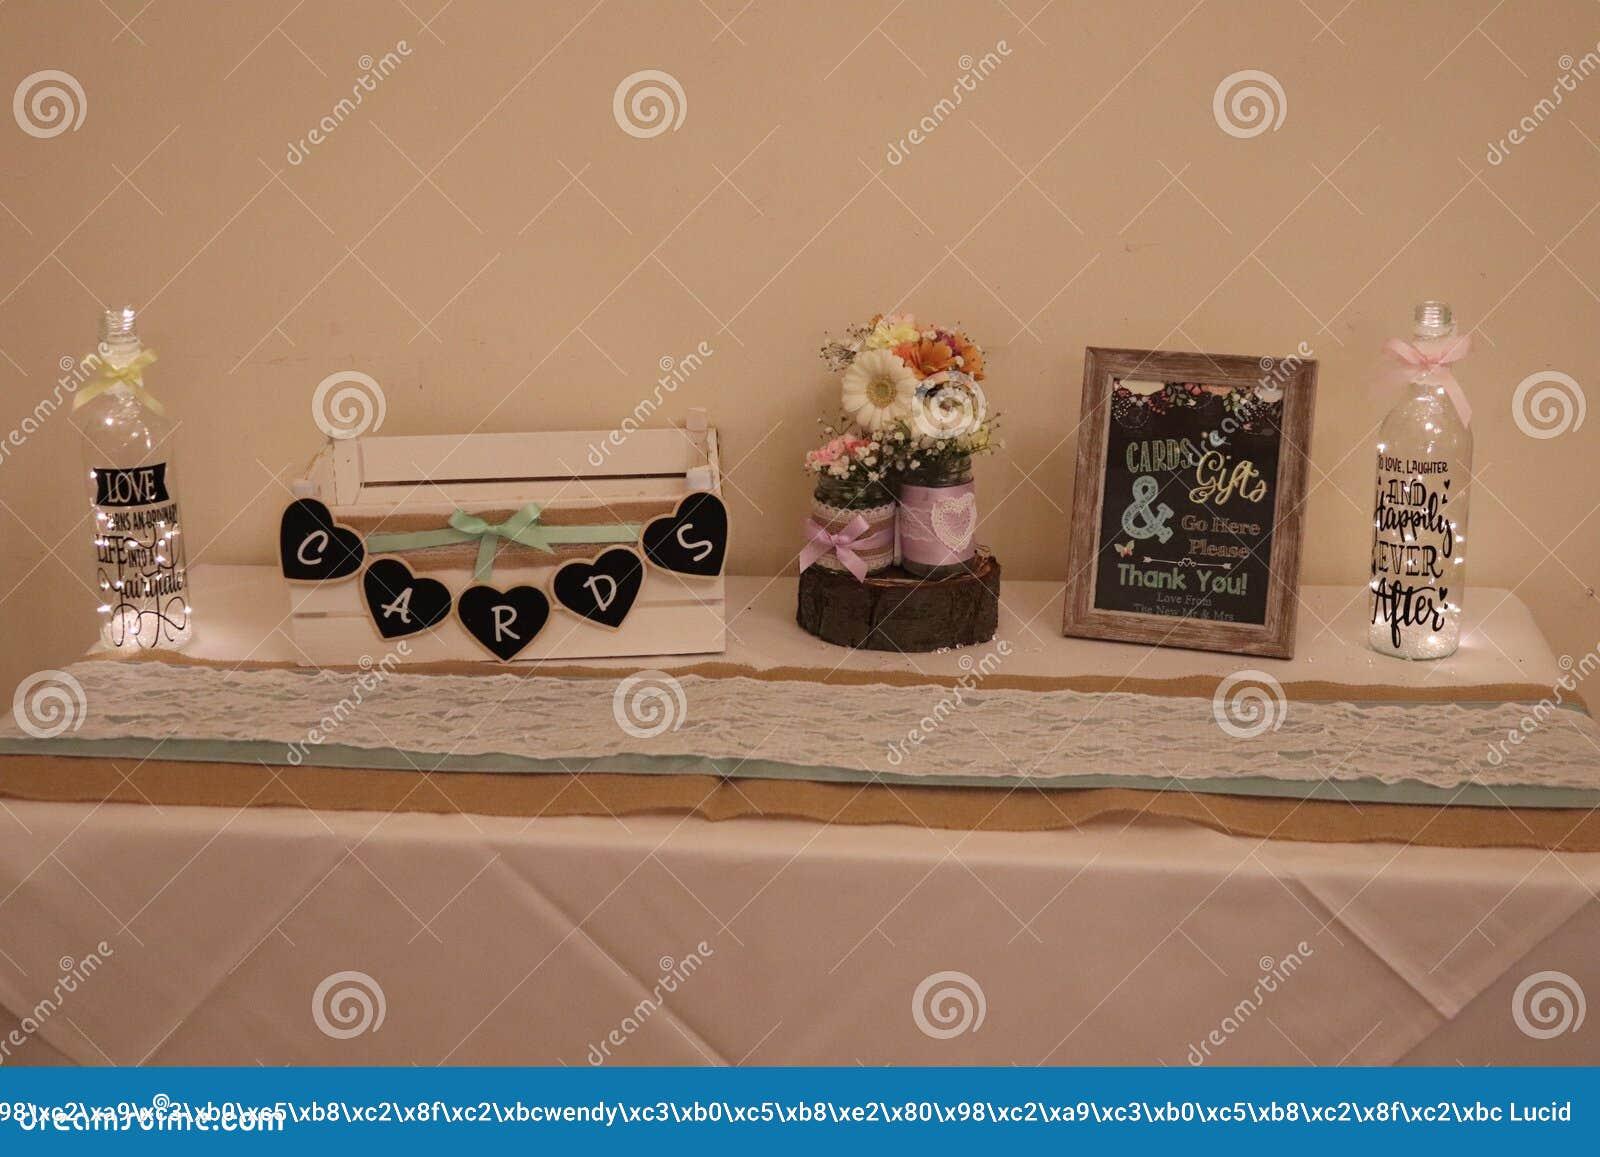 Wedding Gift Table Ideas Stock Photo Image Of Bottles 129456856